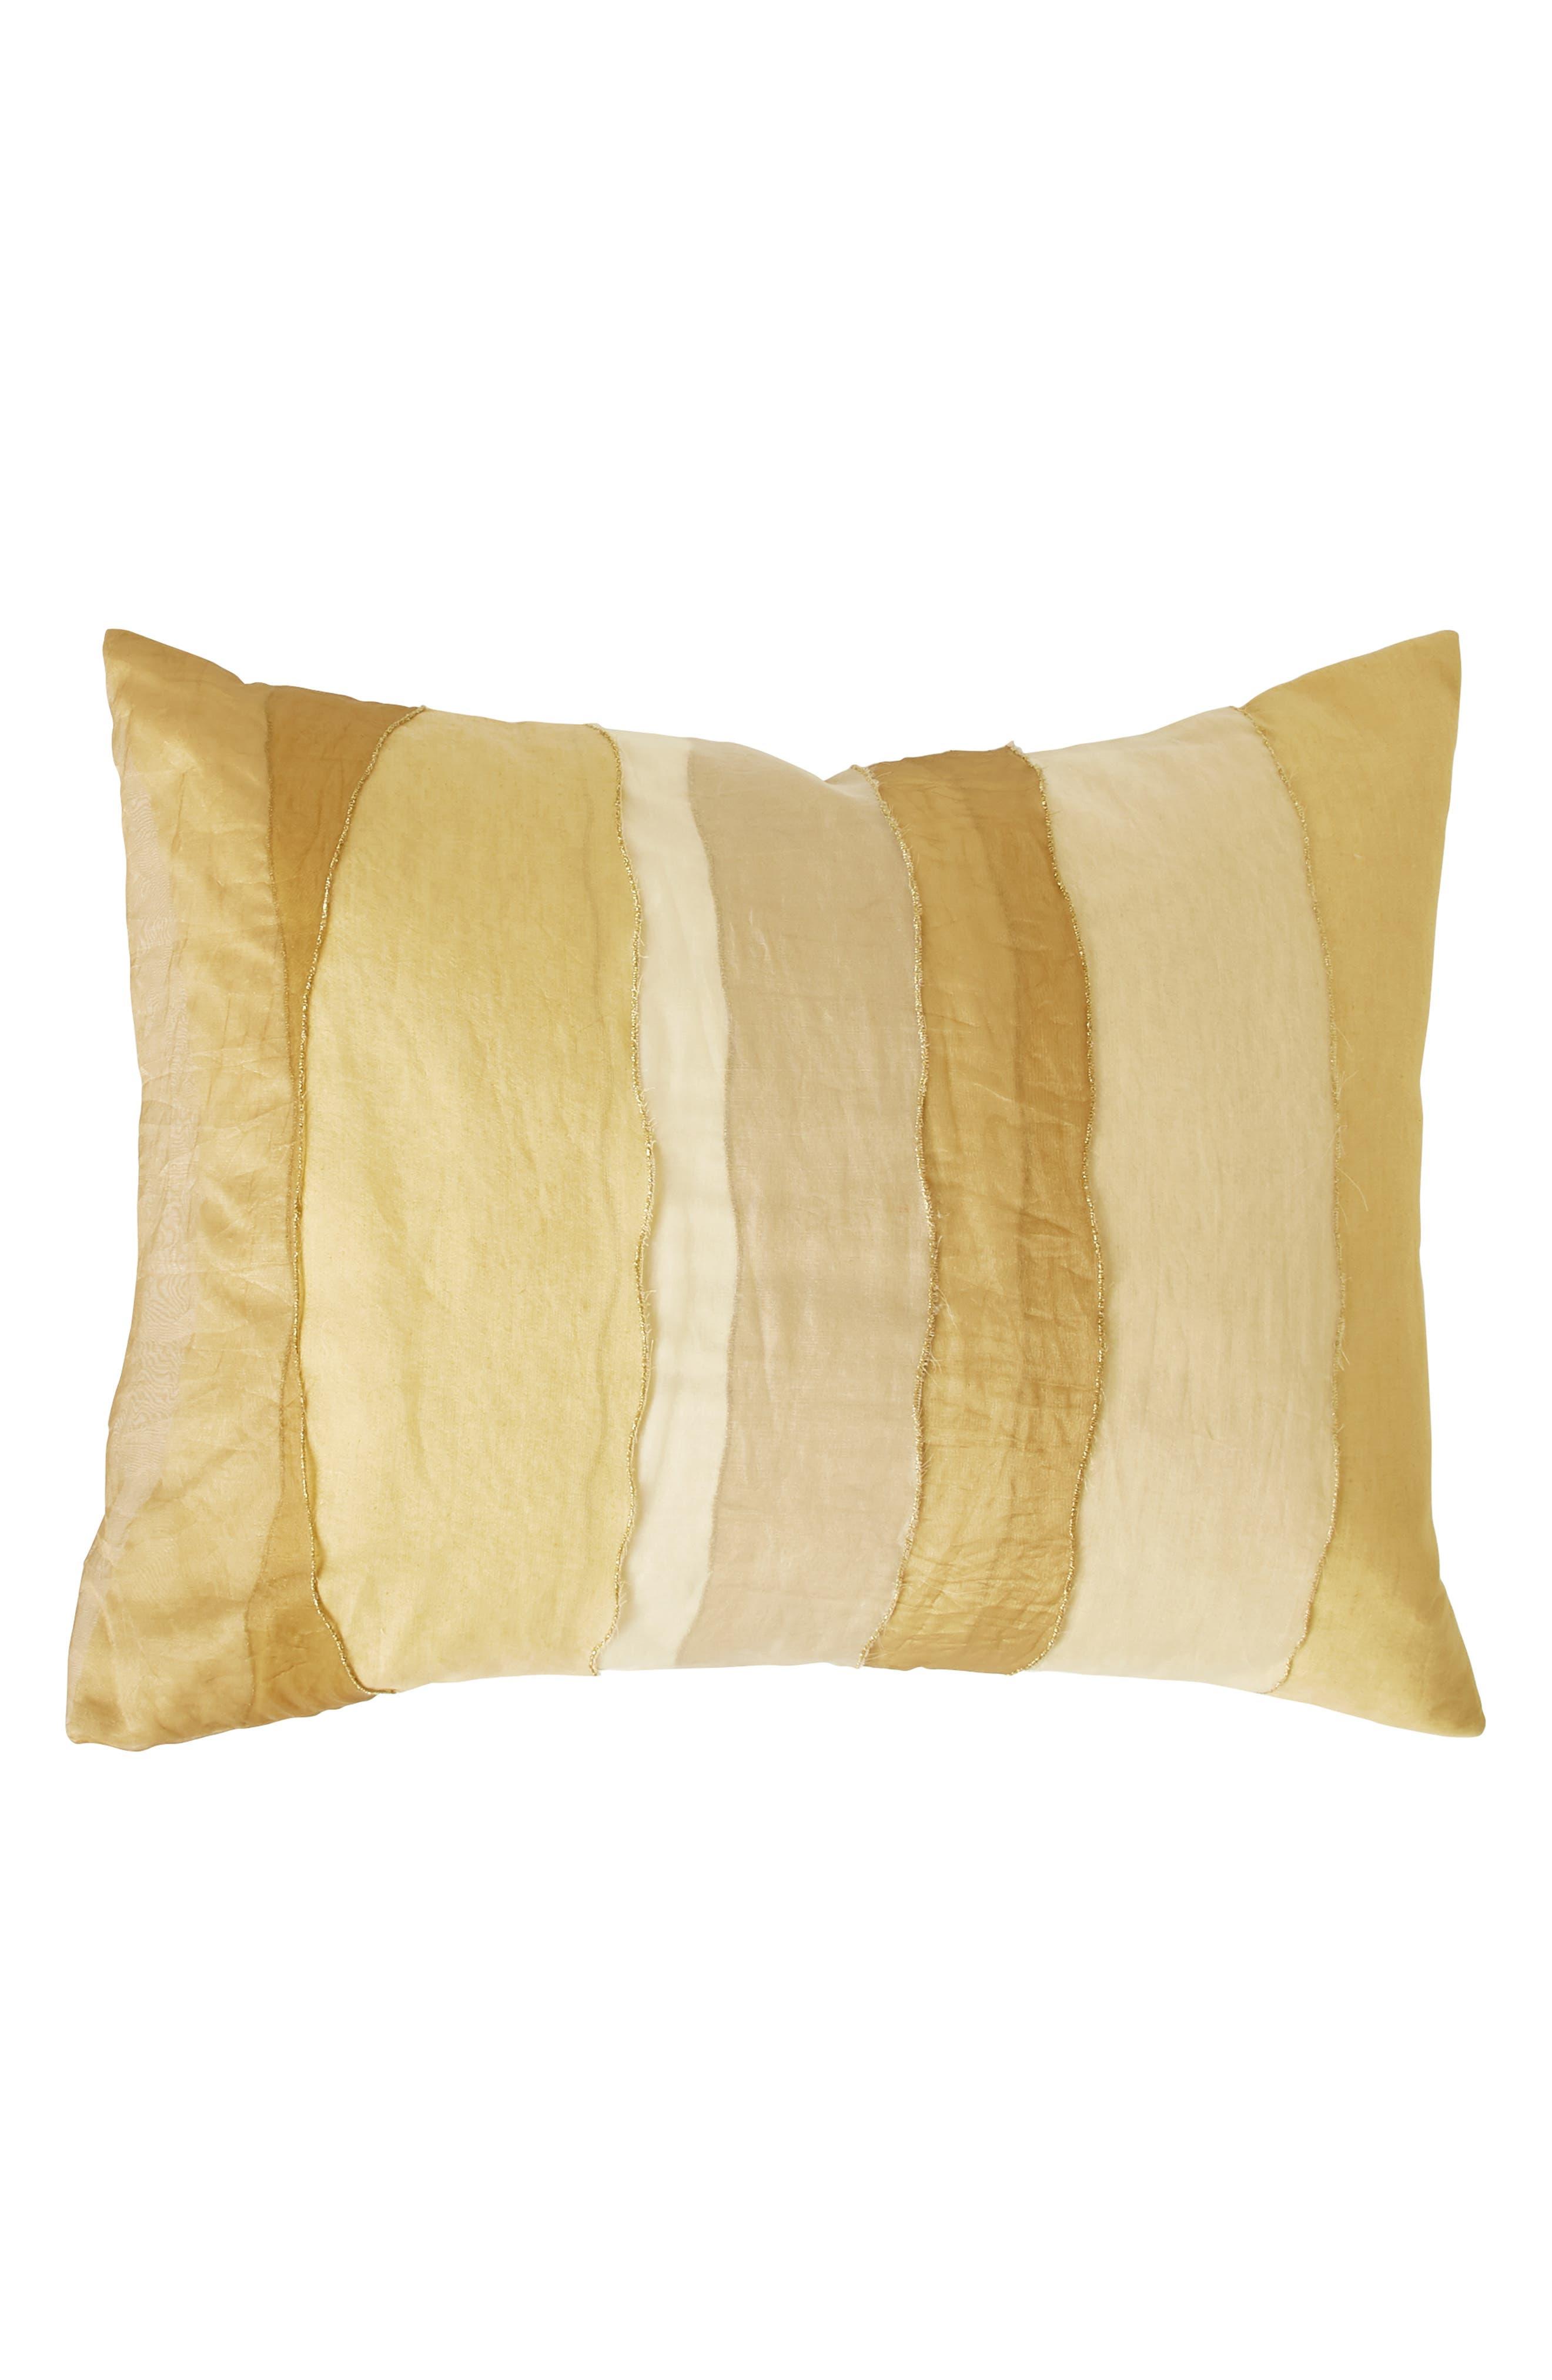 DONNA KARAN NEW YORK, Gilded Sheer Layered Accent Pillow, Main thumbnail 1, color, GOLD